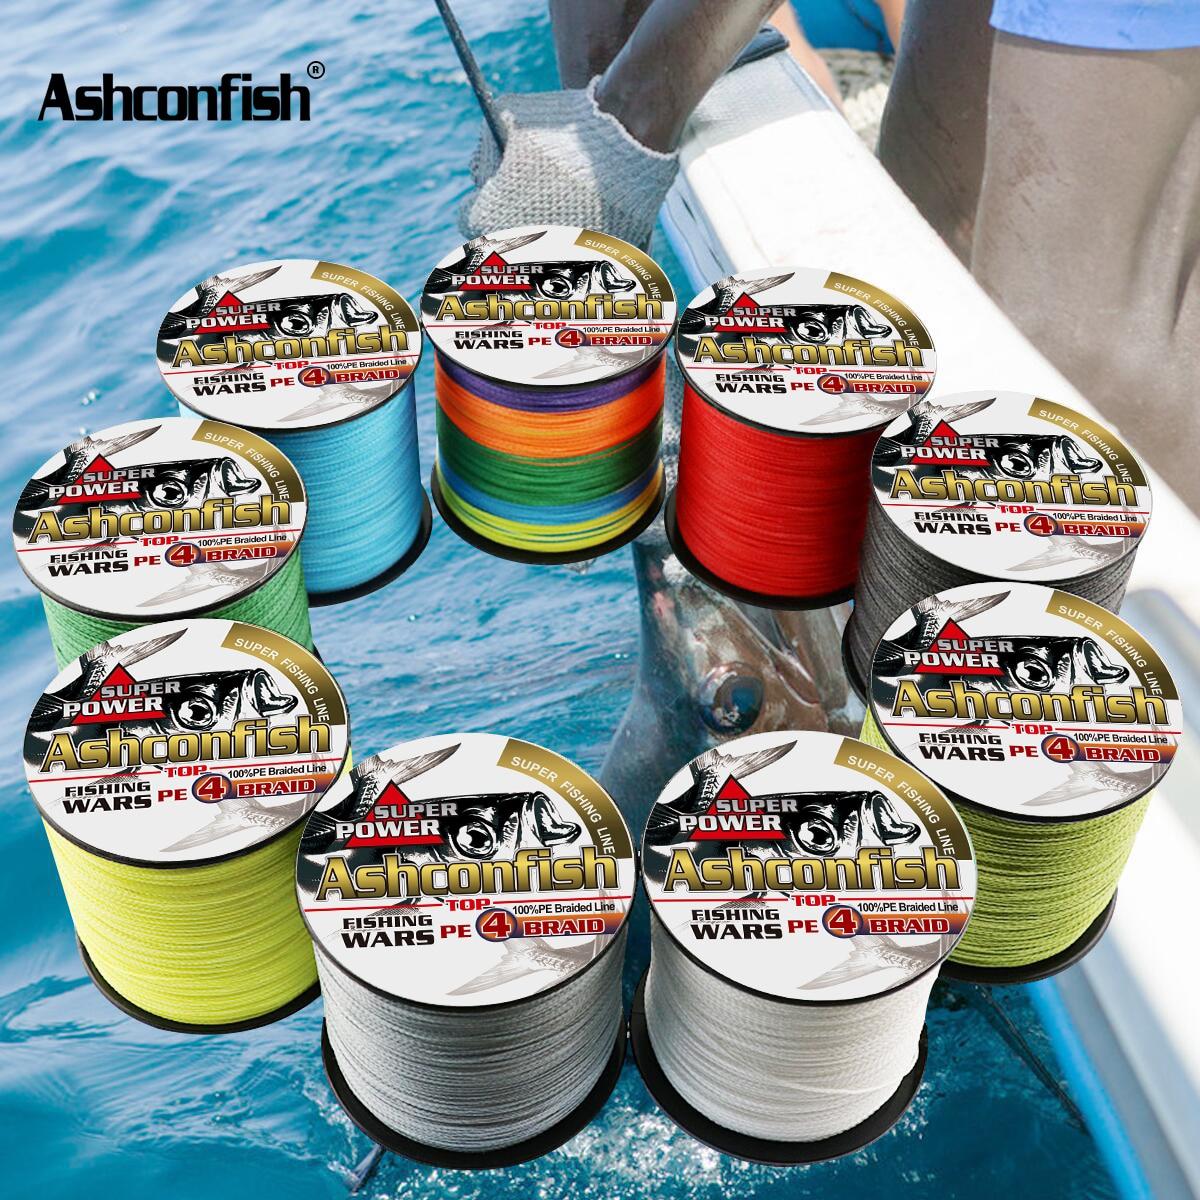 Ashconfish 300M 4 hebras de agua dulce/agua salada trenzada línea de pesca 6-100LB x4 Multilament línea trenzada para la pesca de carpa 0,2 0,55mm